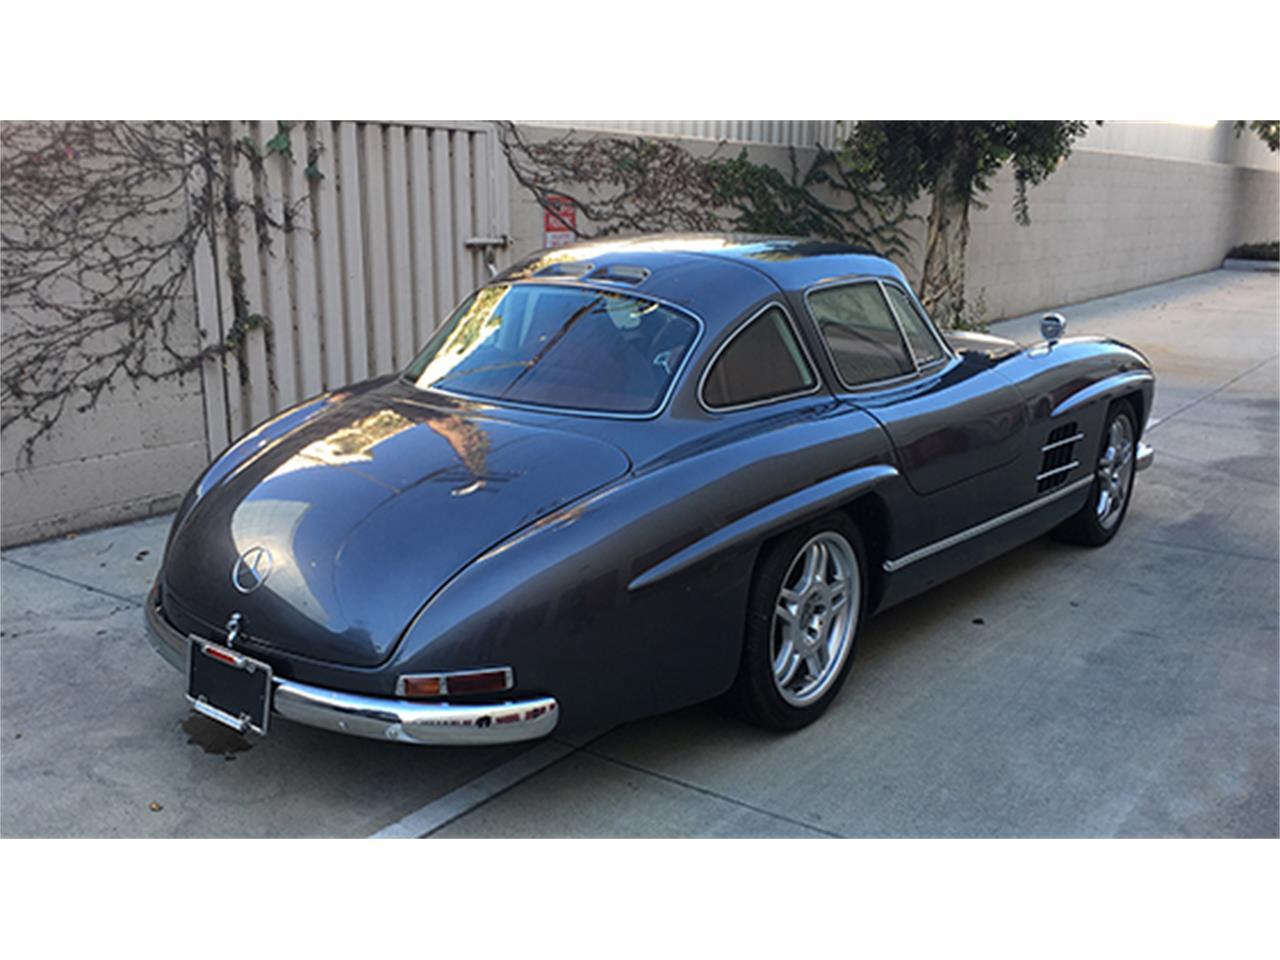 1955 Mercedes-Benz 300 SL Gullwing Replica for Sale ...